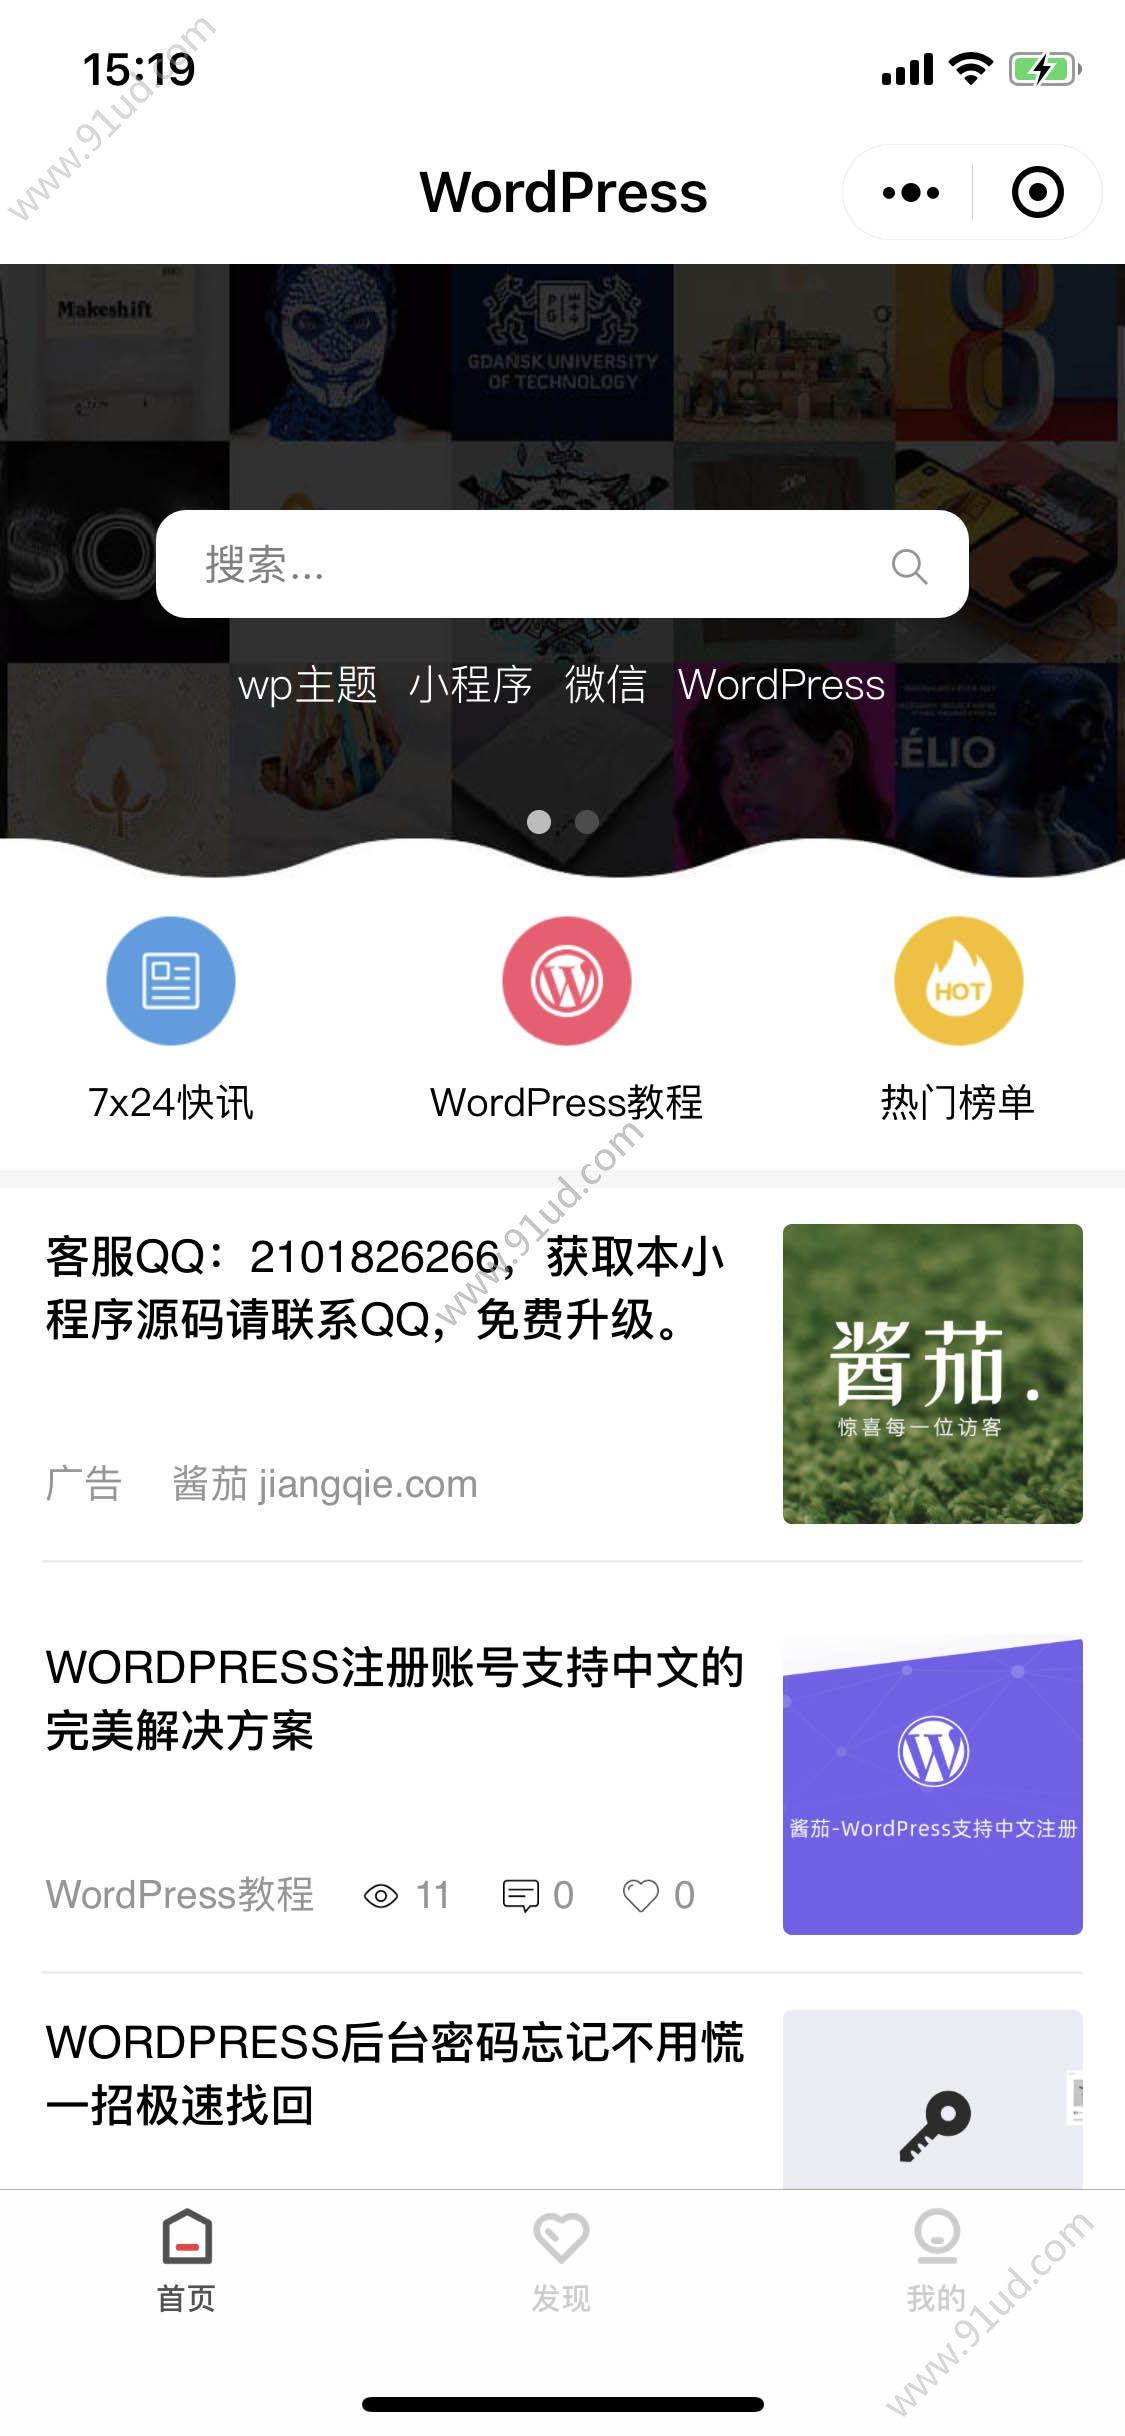 WordPress中文网小程序截图